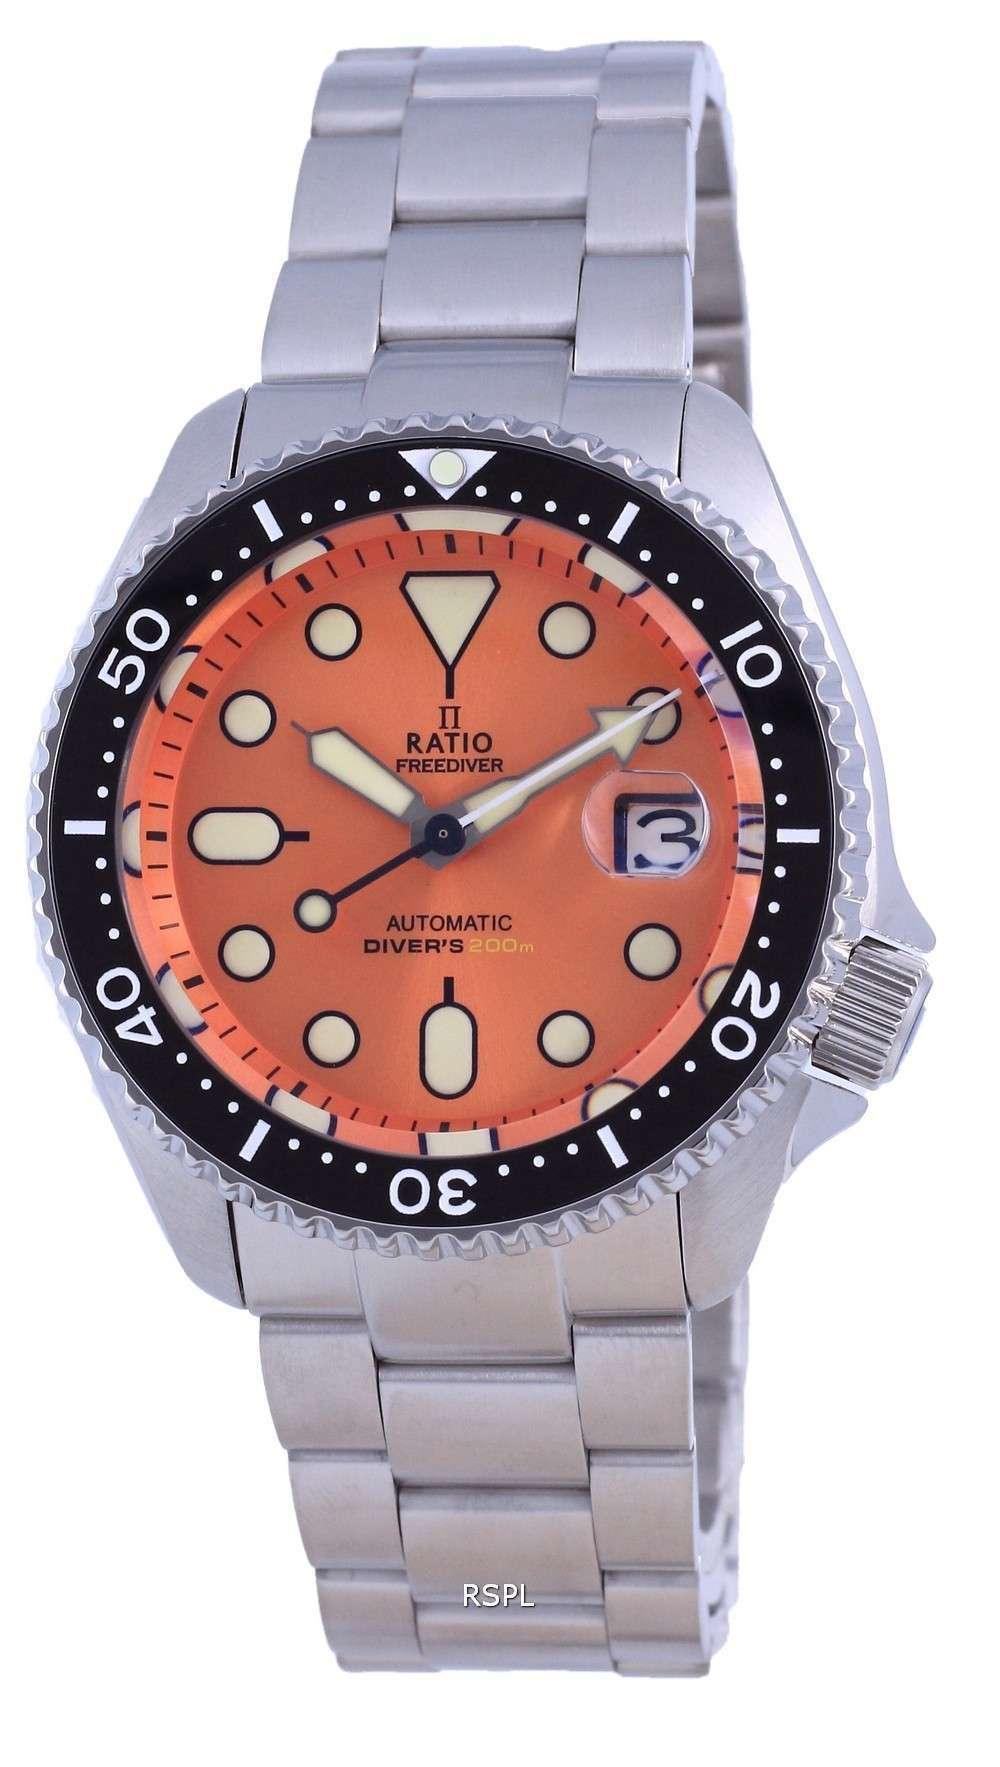 Ratio FreeDiver Dial naranja Acero inoxidable Automático RTB214 200M Reloj para hombre